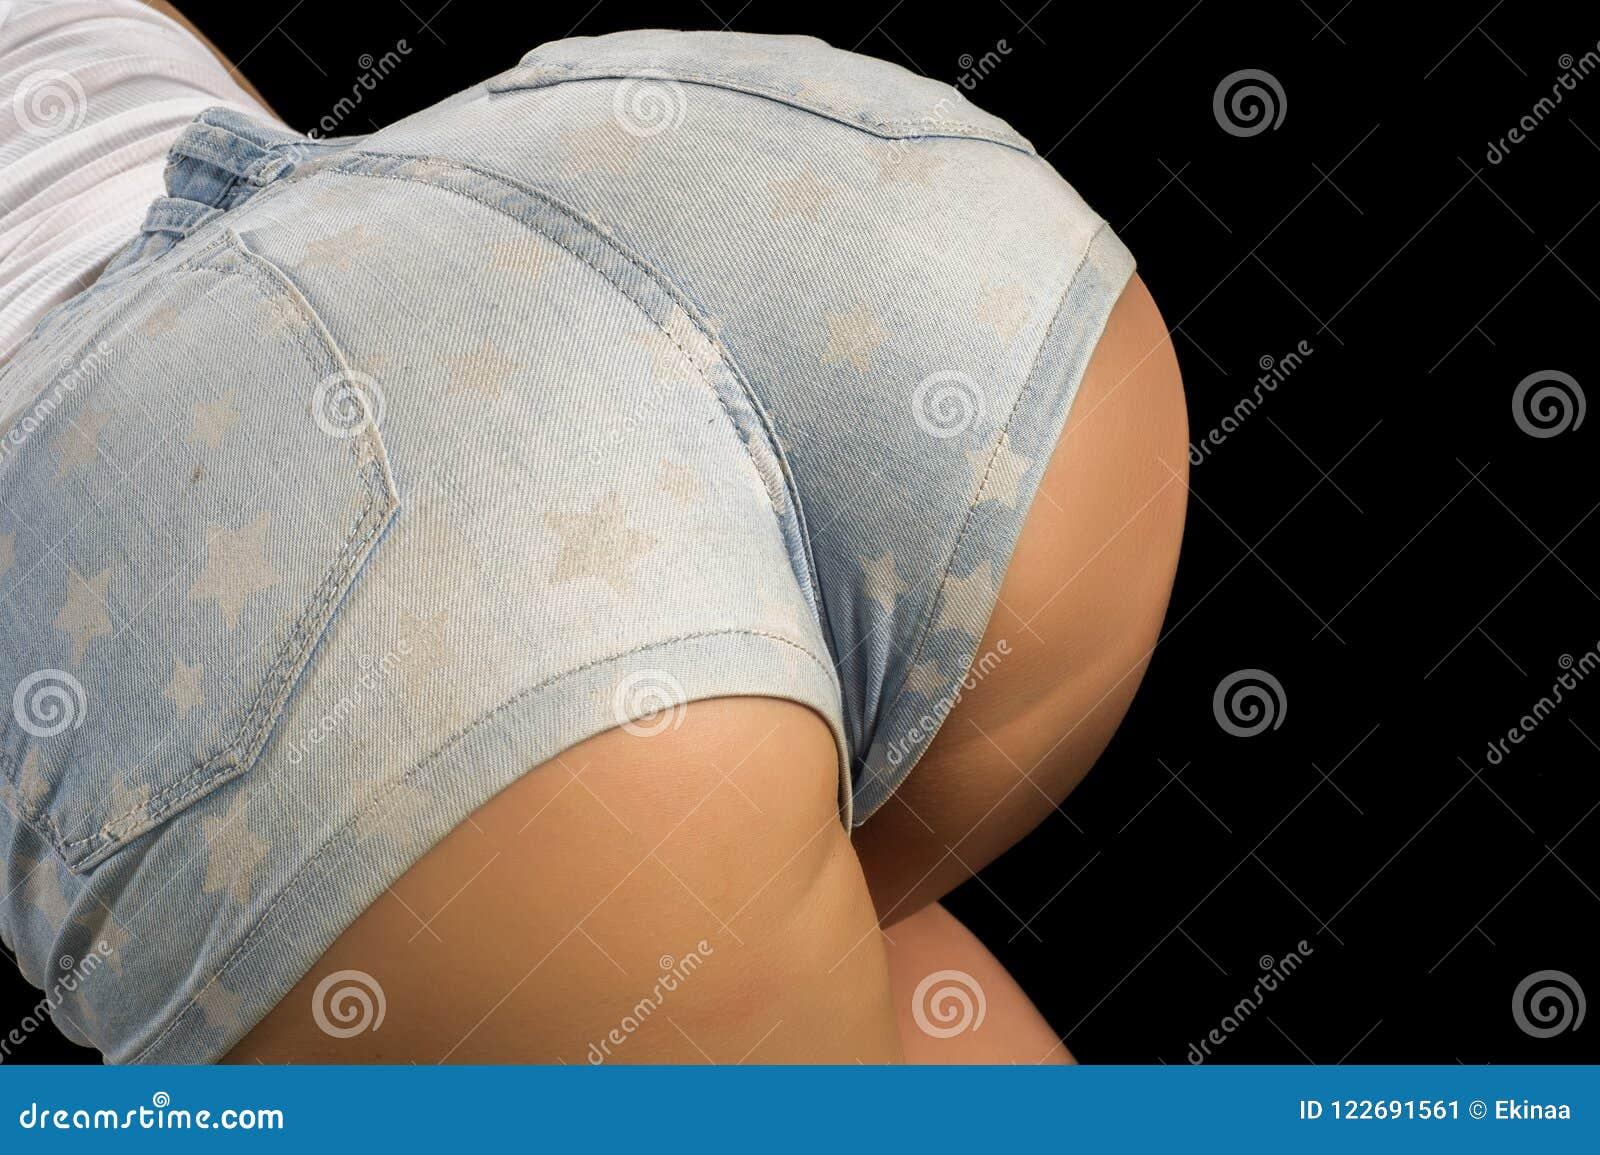 ass, bum, butt, asshole, backside, arsehole stock image - image of